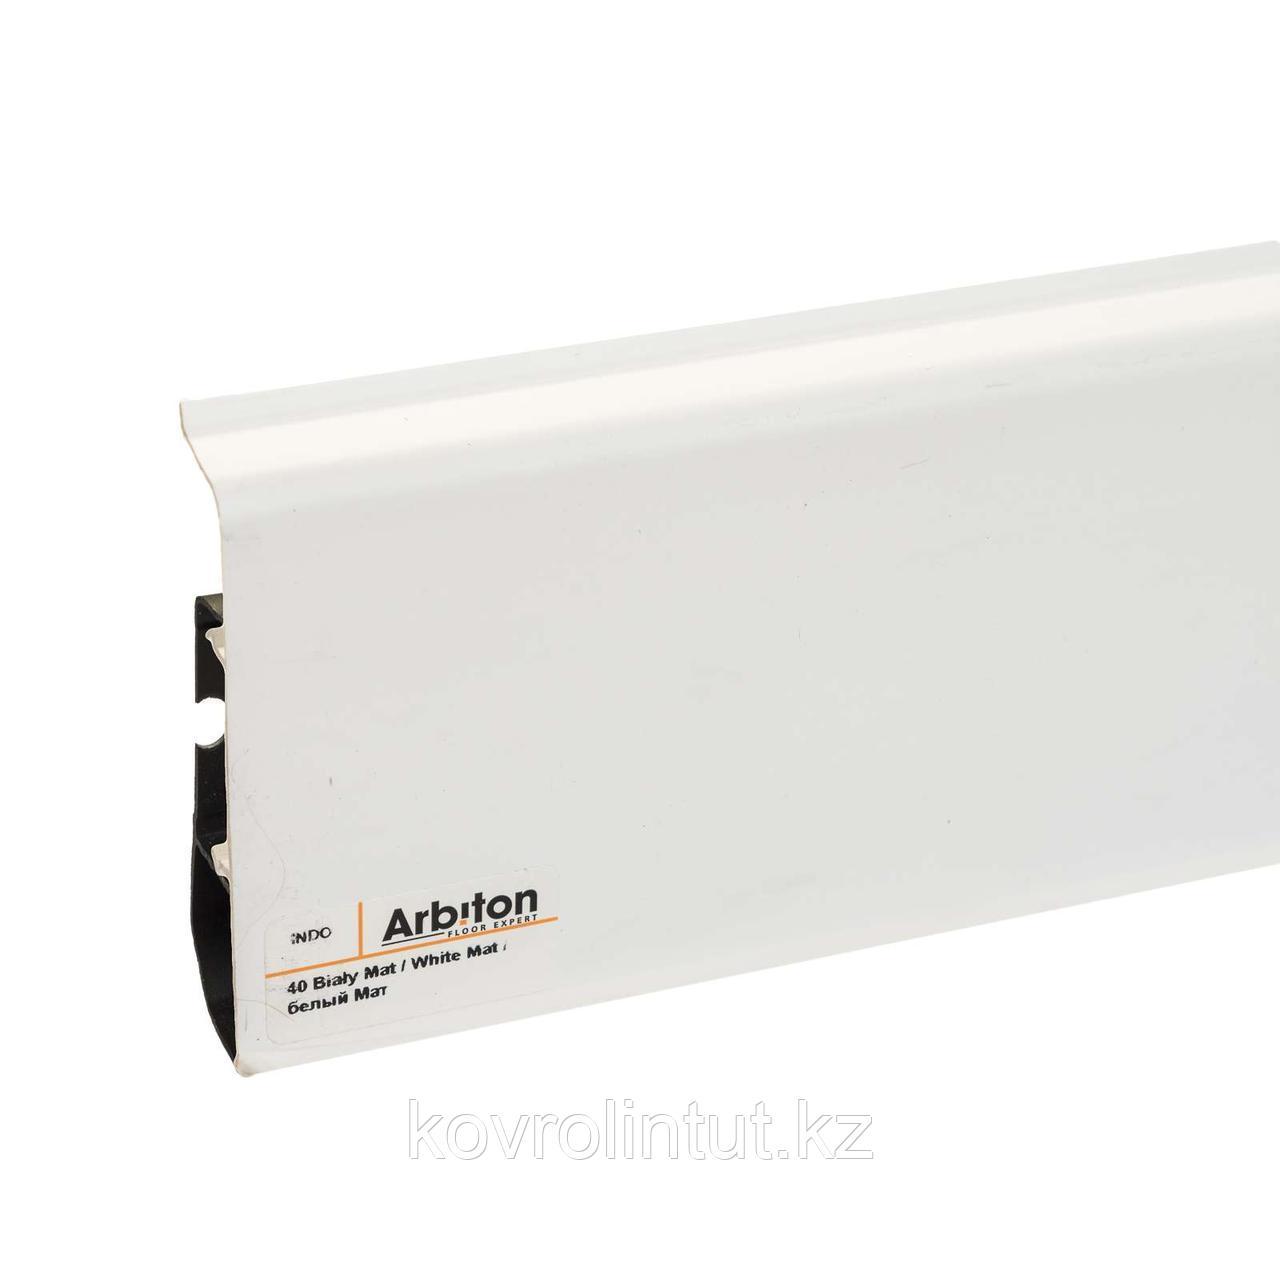 Плинтус Arbiton Indo 40, Белый Матовый, 2500х70х26 мм